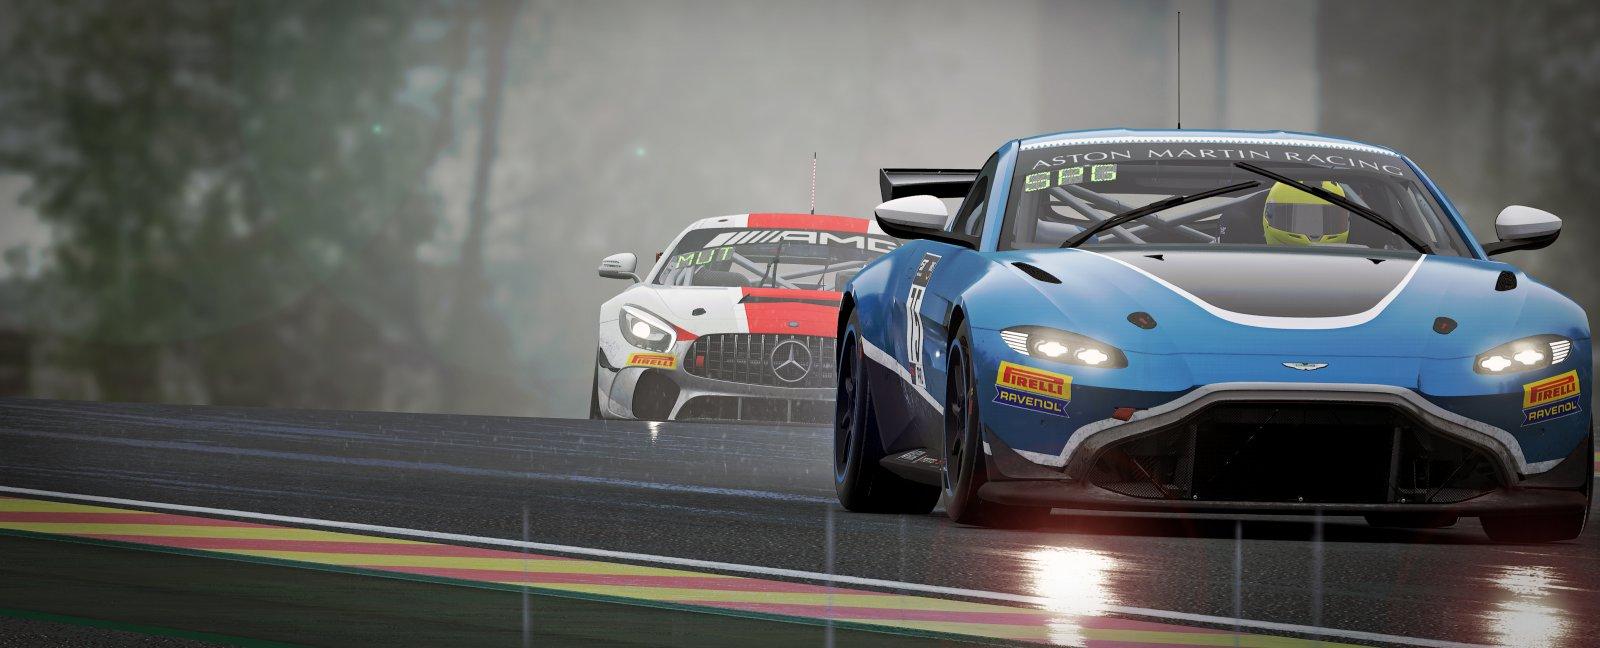 Assetto Corsa Competizione Screenshot 2020.11.14 - 19.46.23.79.jpg